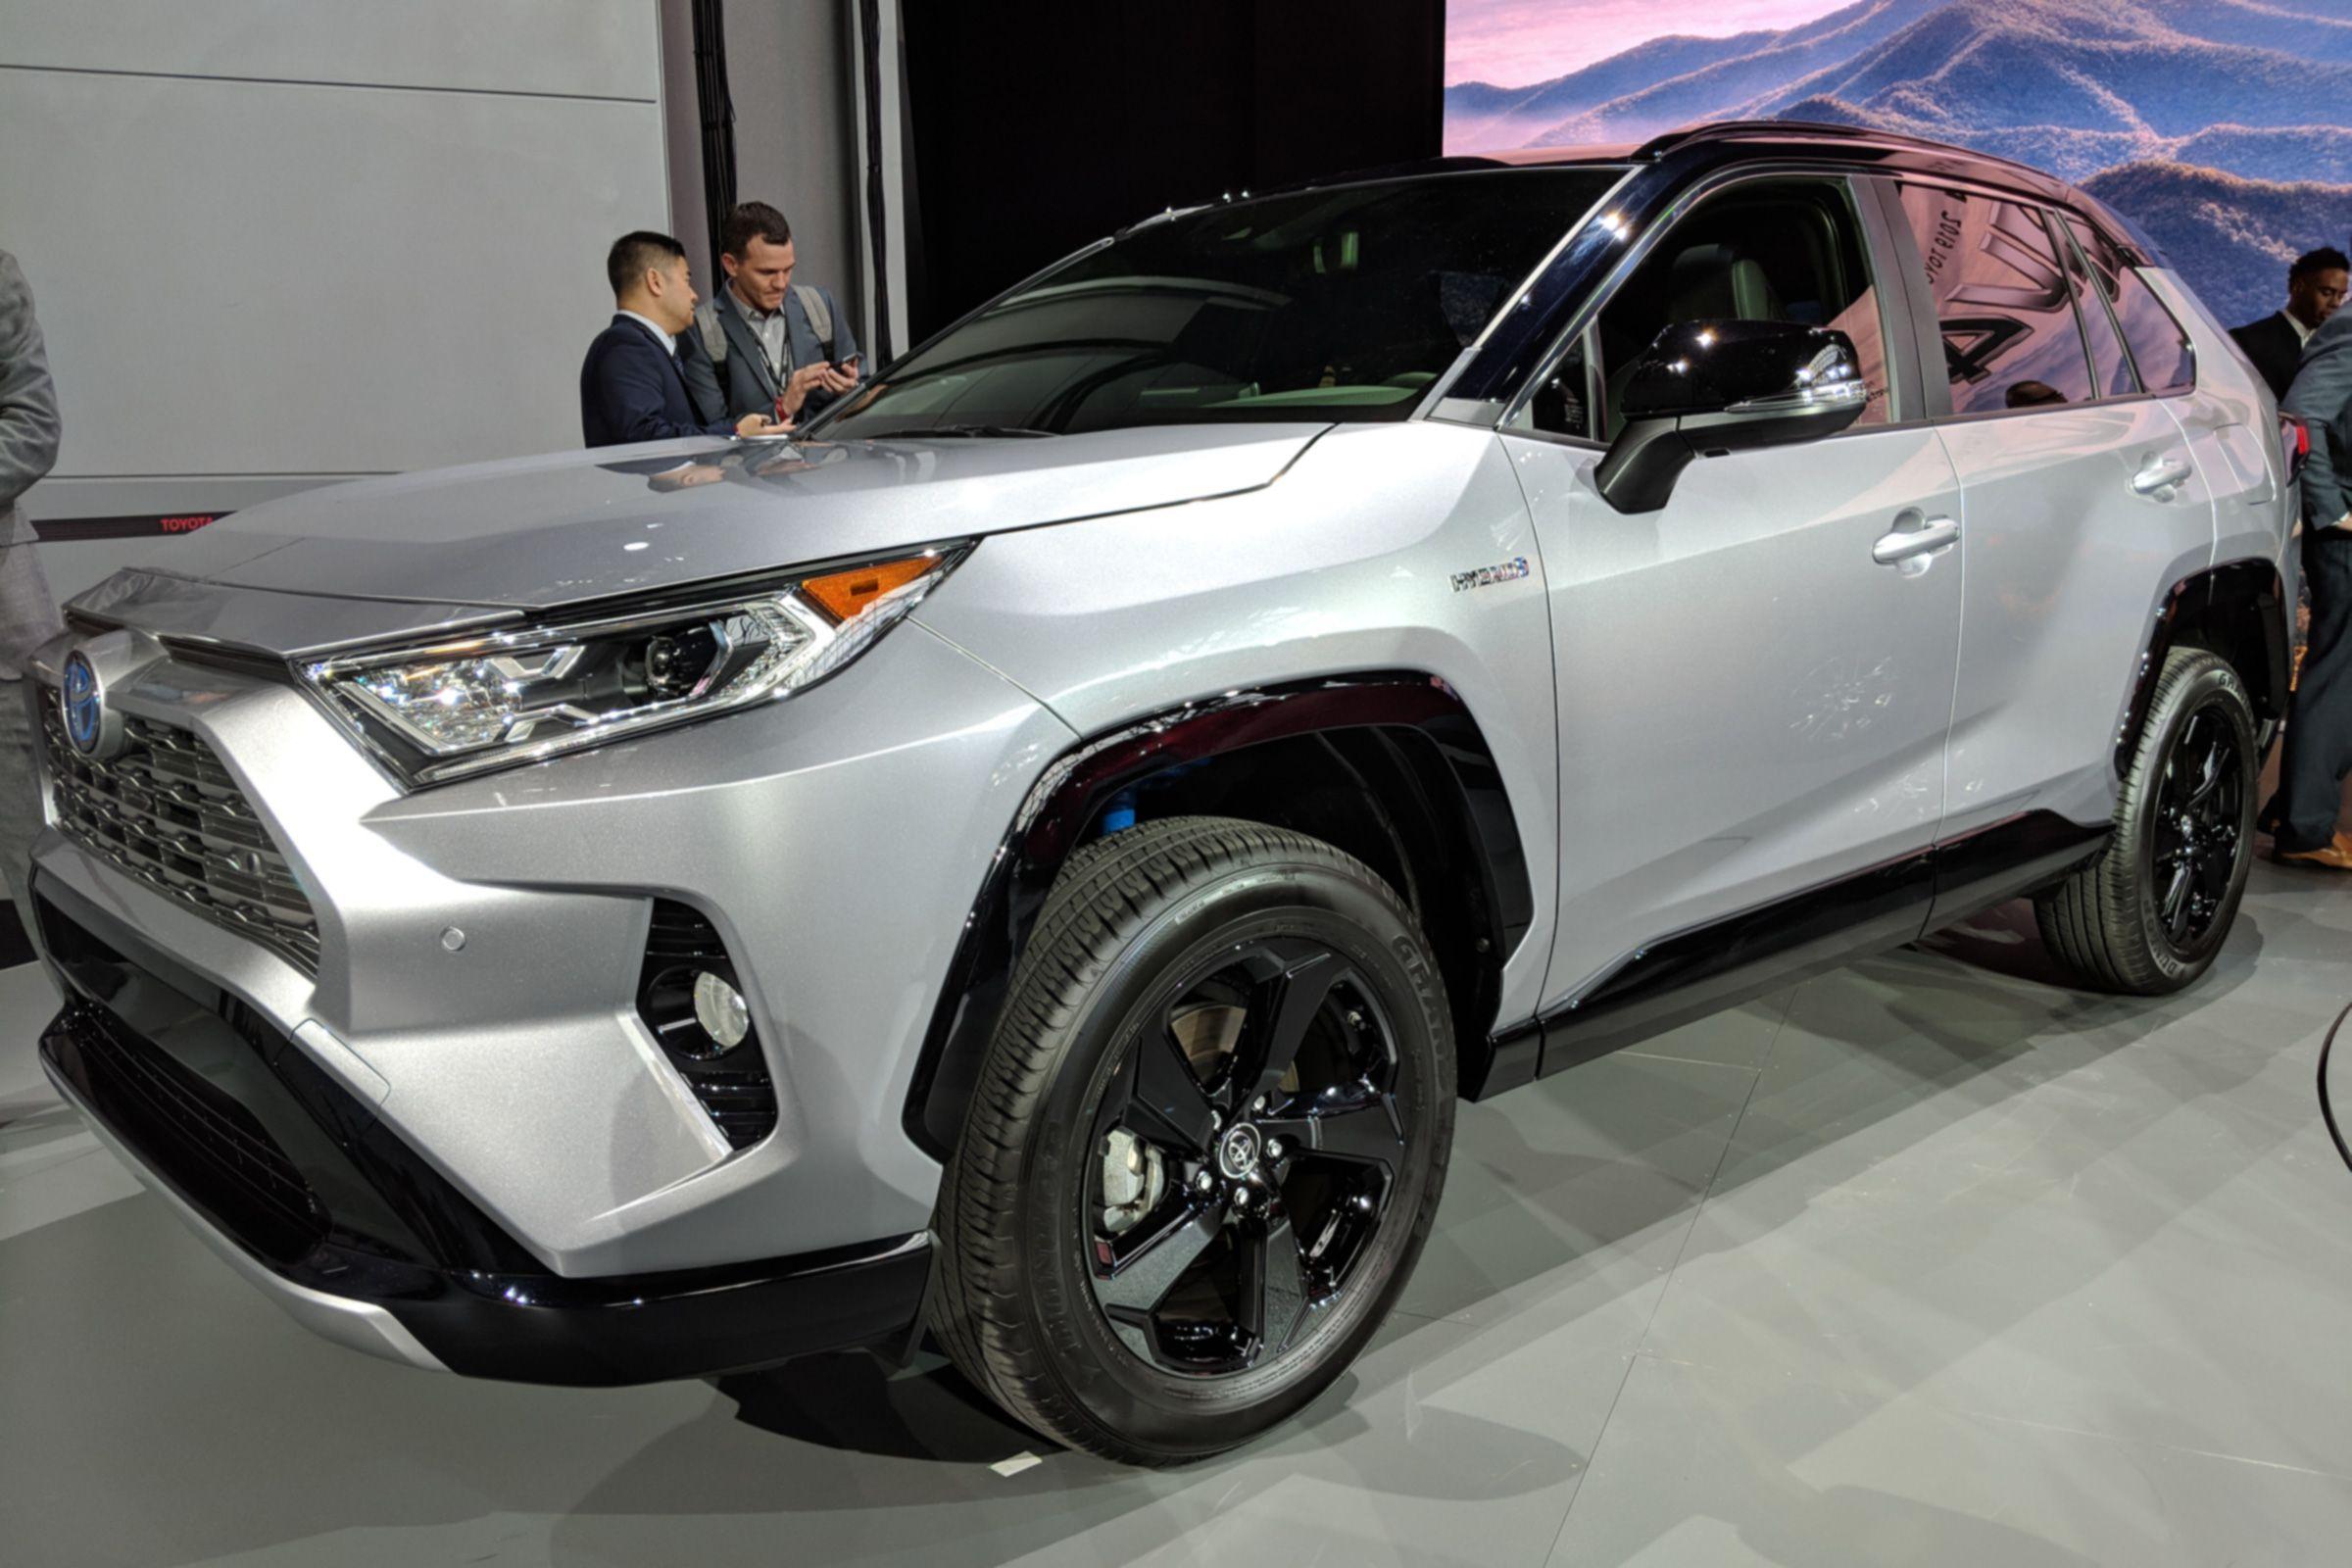 New Toyota Rav4 Revealed With Hybrid Powertrain And Design Cues From The Ft Ac Concept Toyota Rav4 Suv Toyota Rav4 Rav4